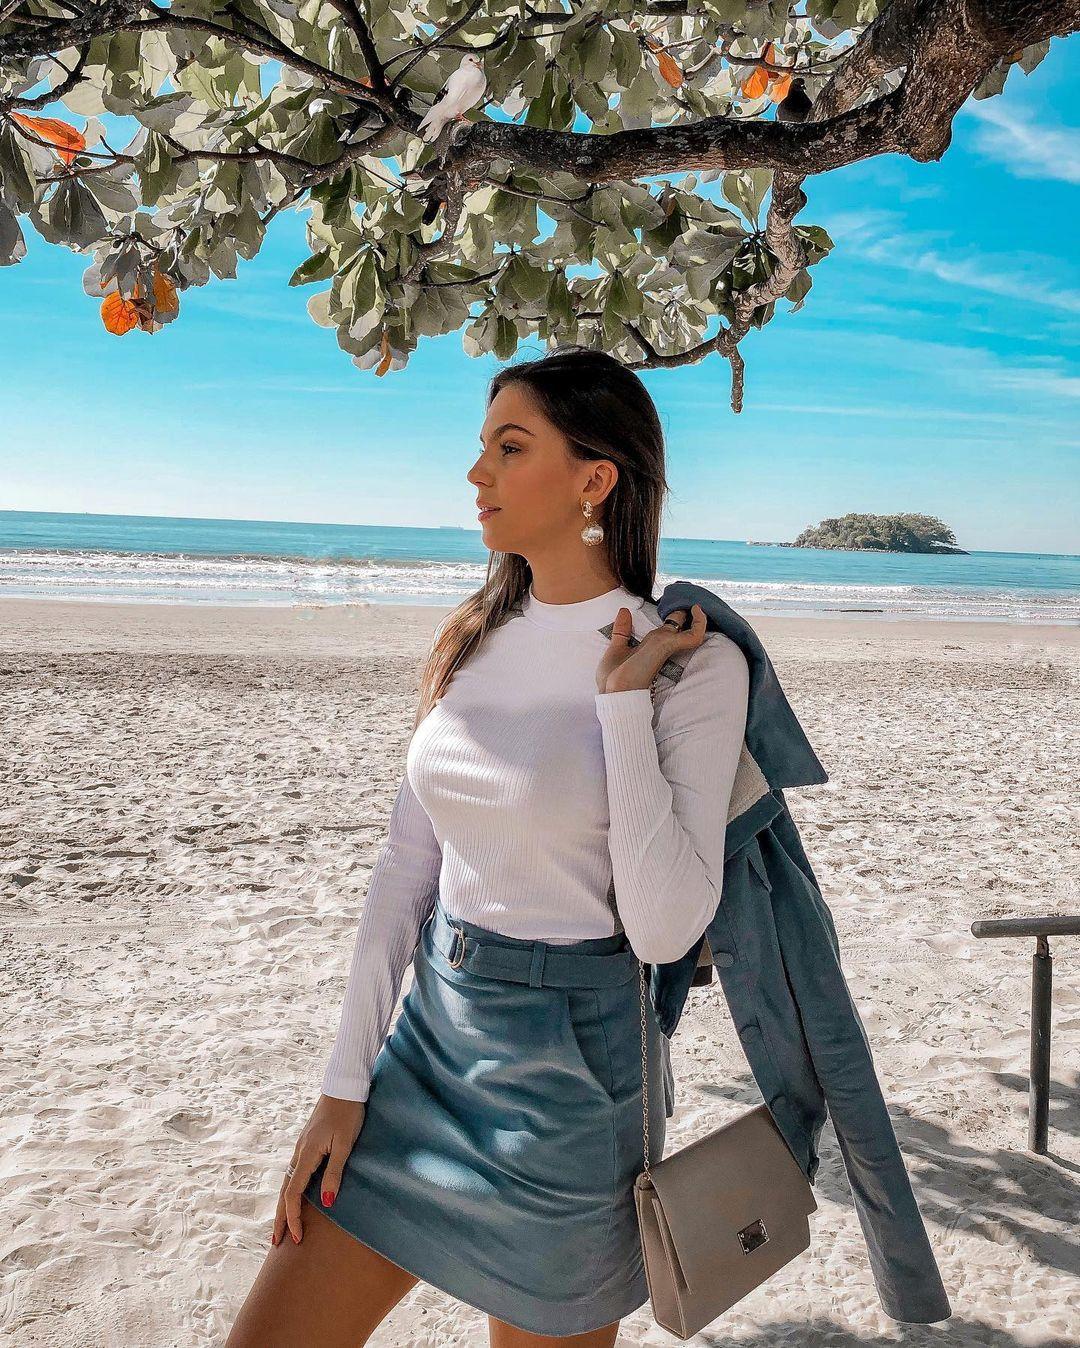 ana flavia giacomini, miss ilha dos lobos mundo 2019. - Página 4 Fwvtaf10